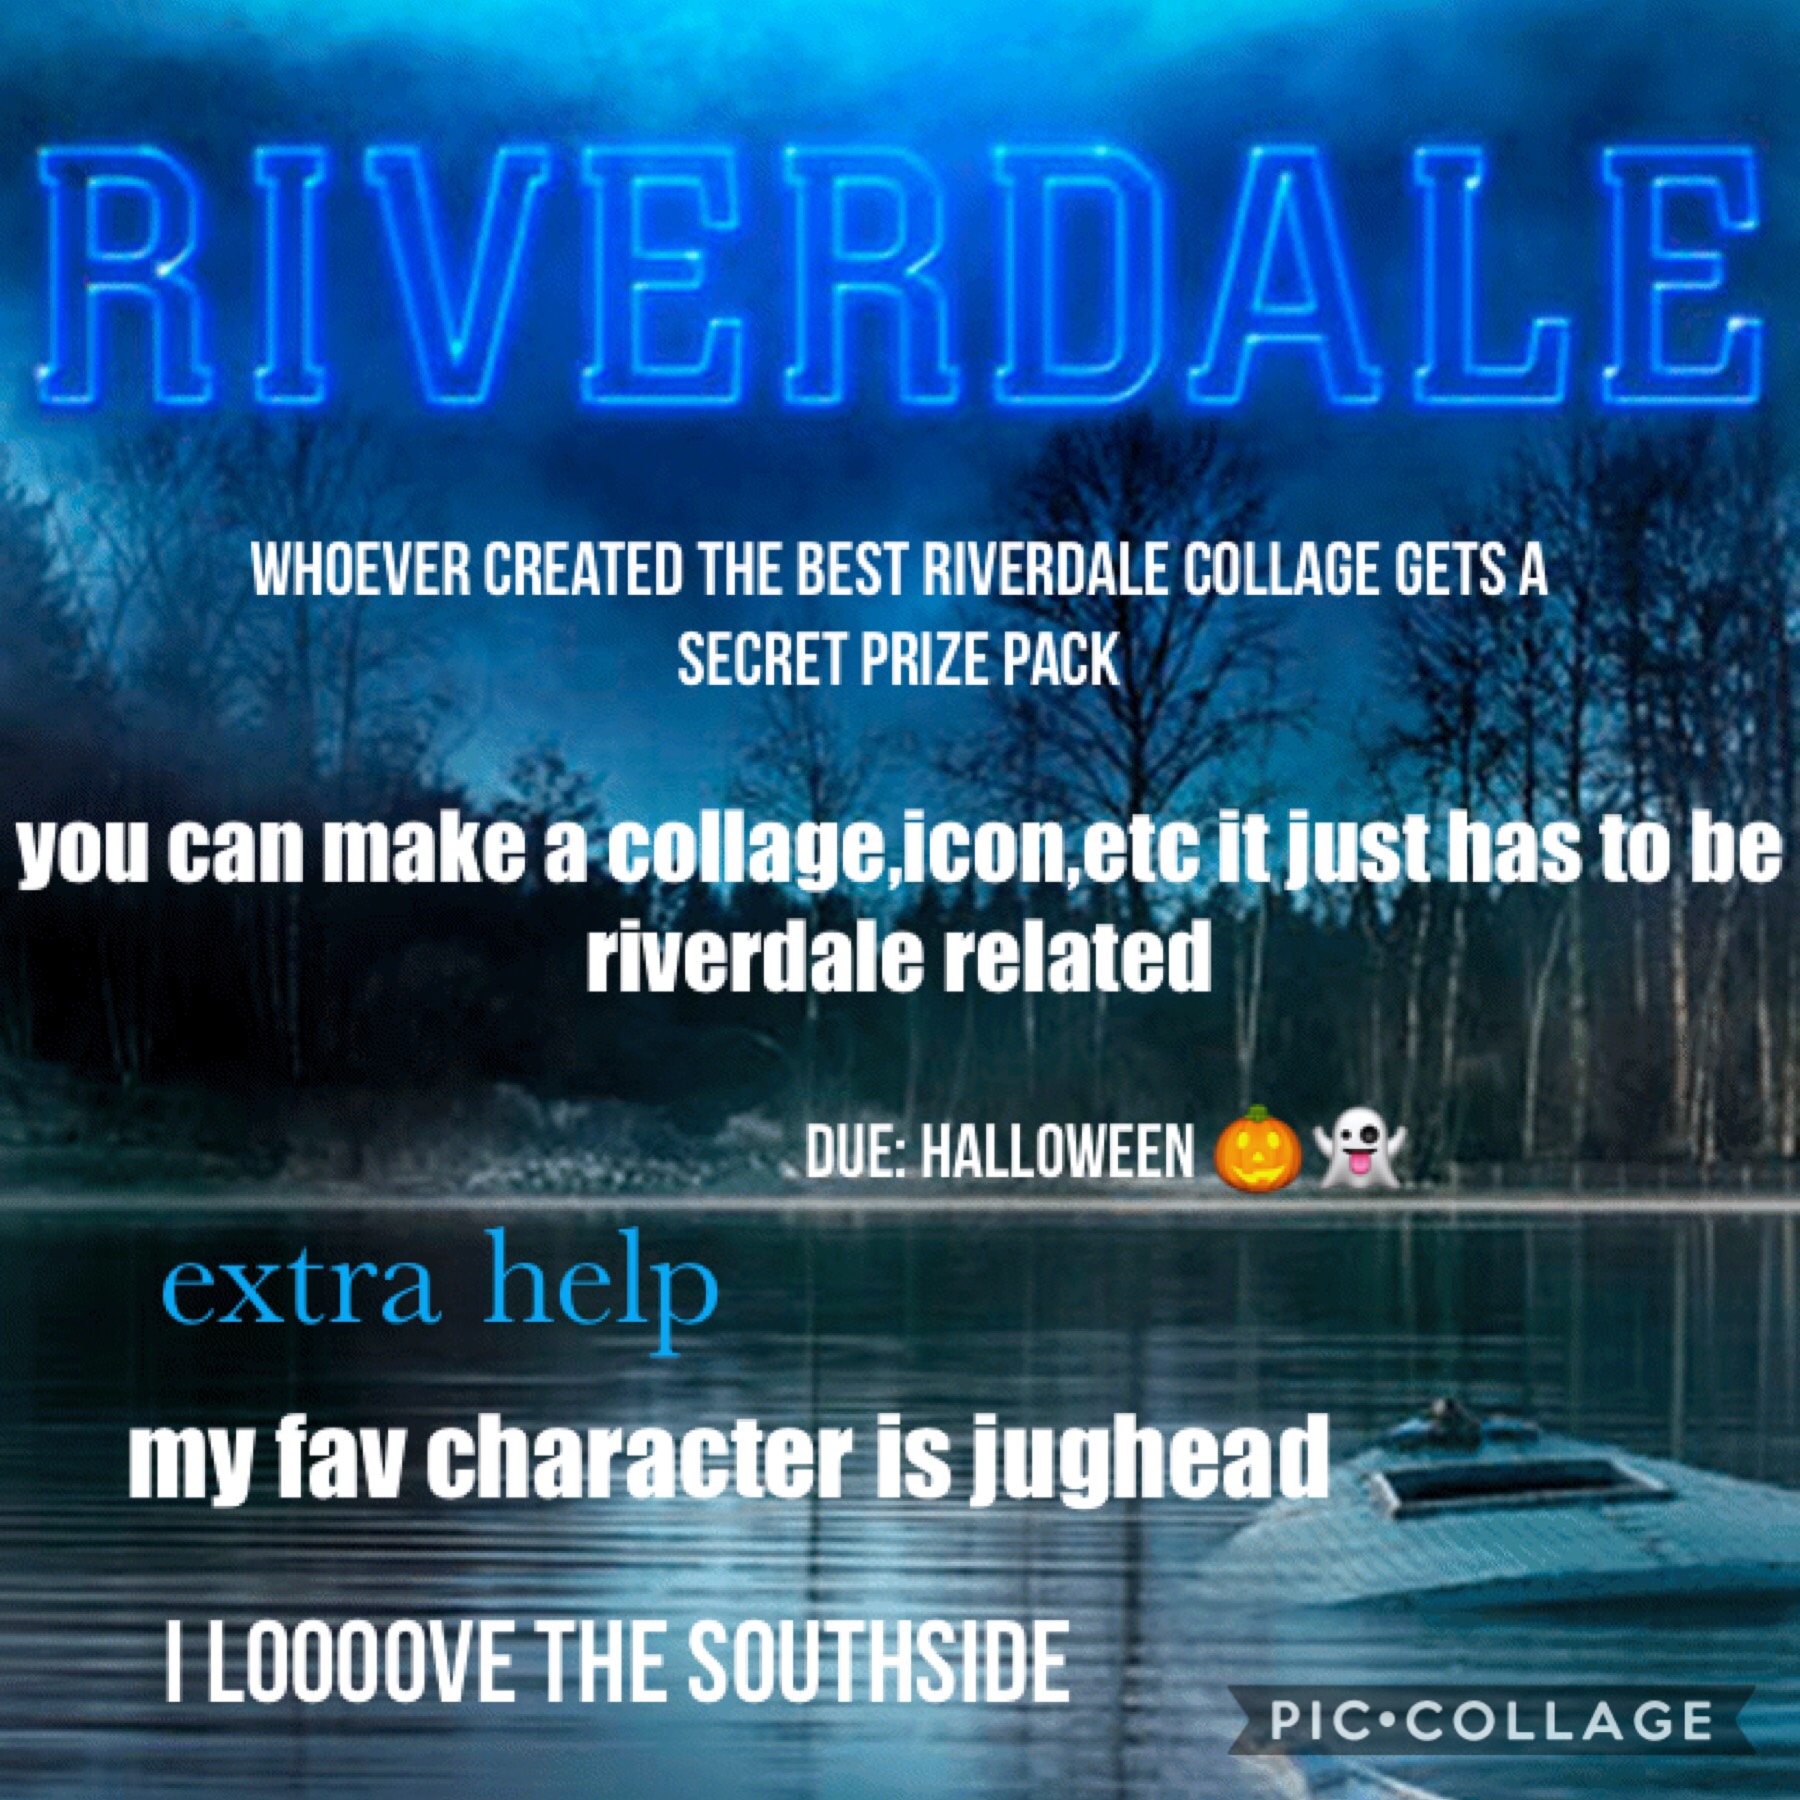 RIVERDALE CHALLENGE